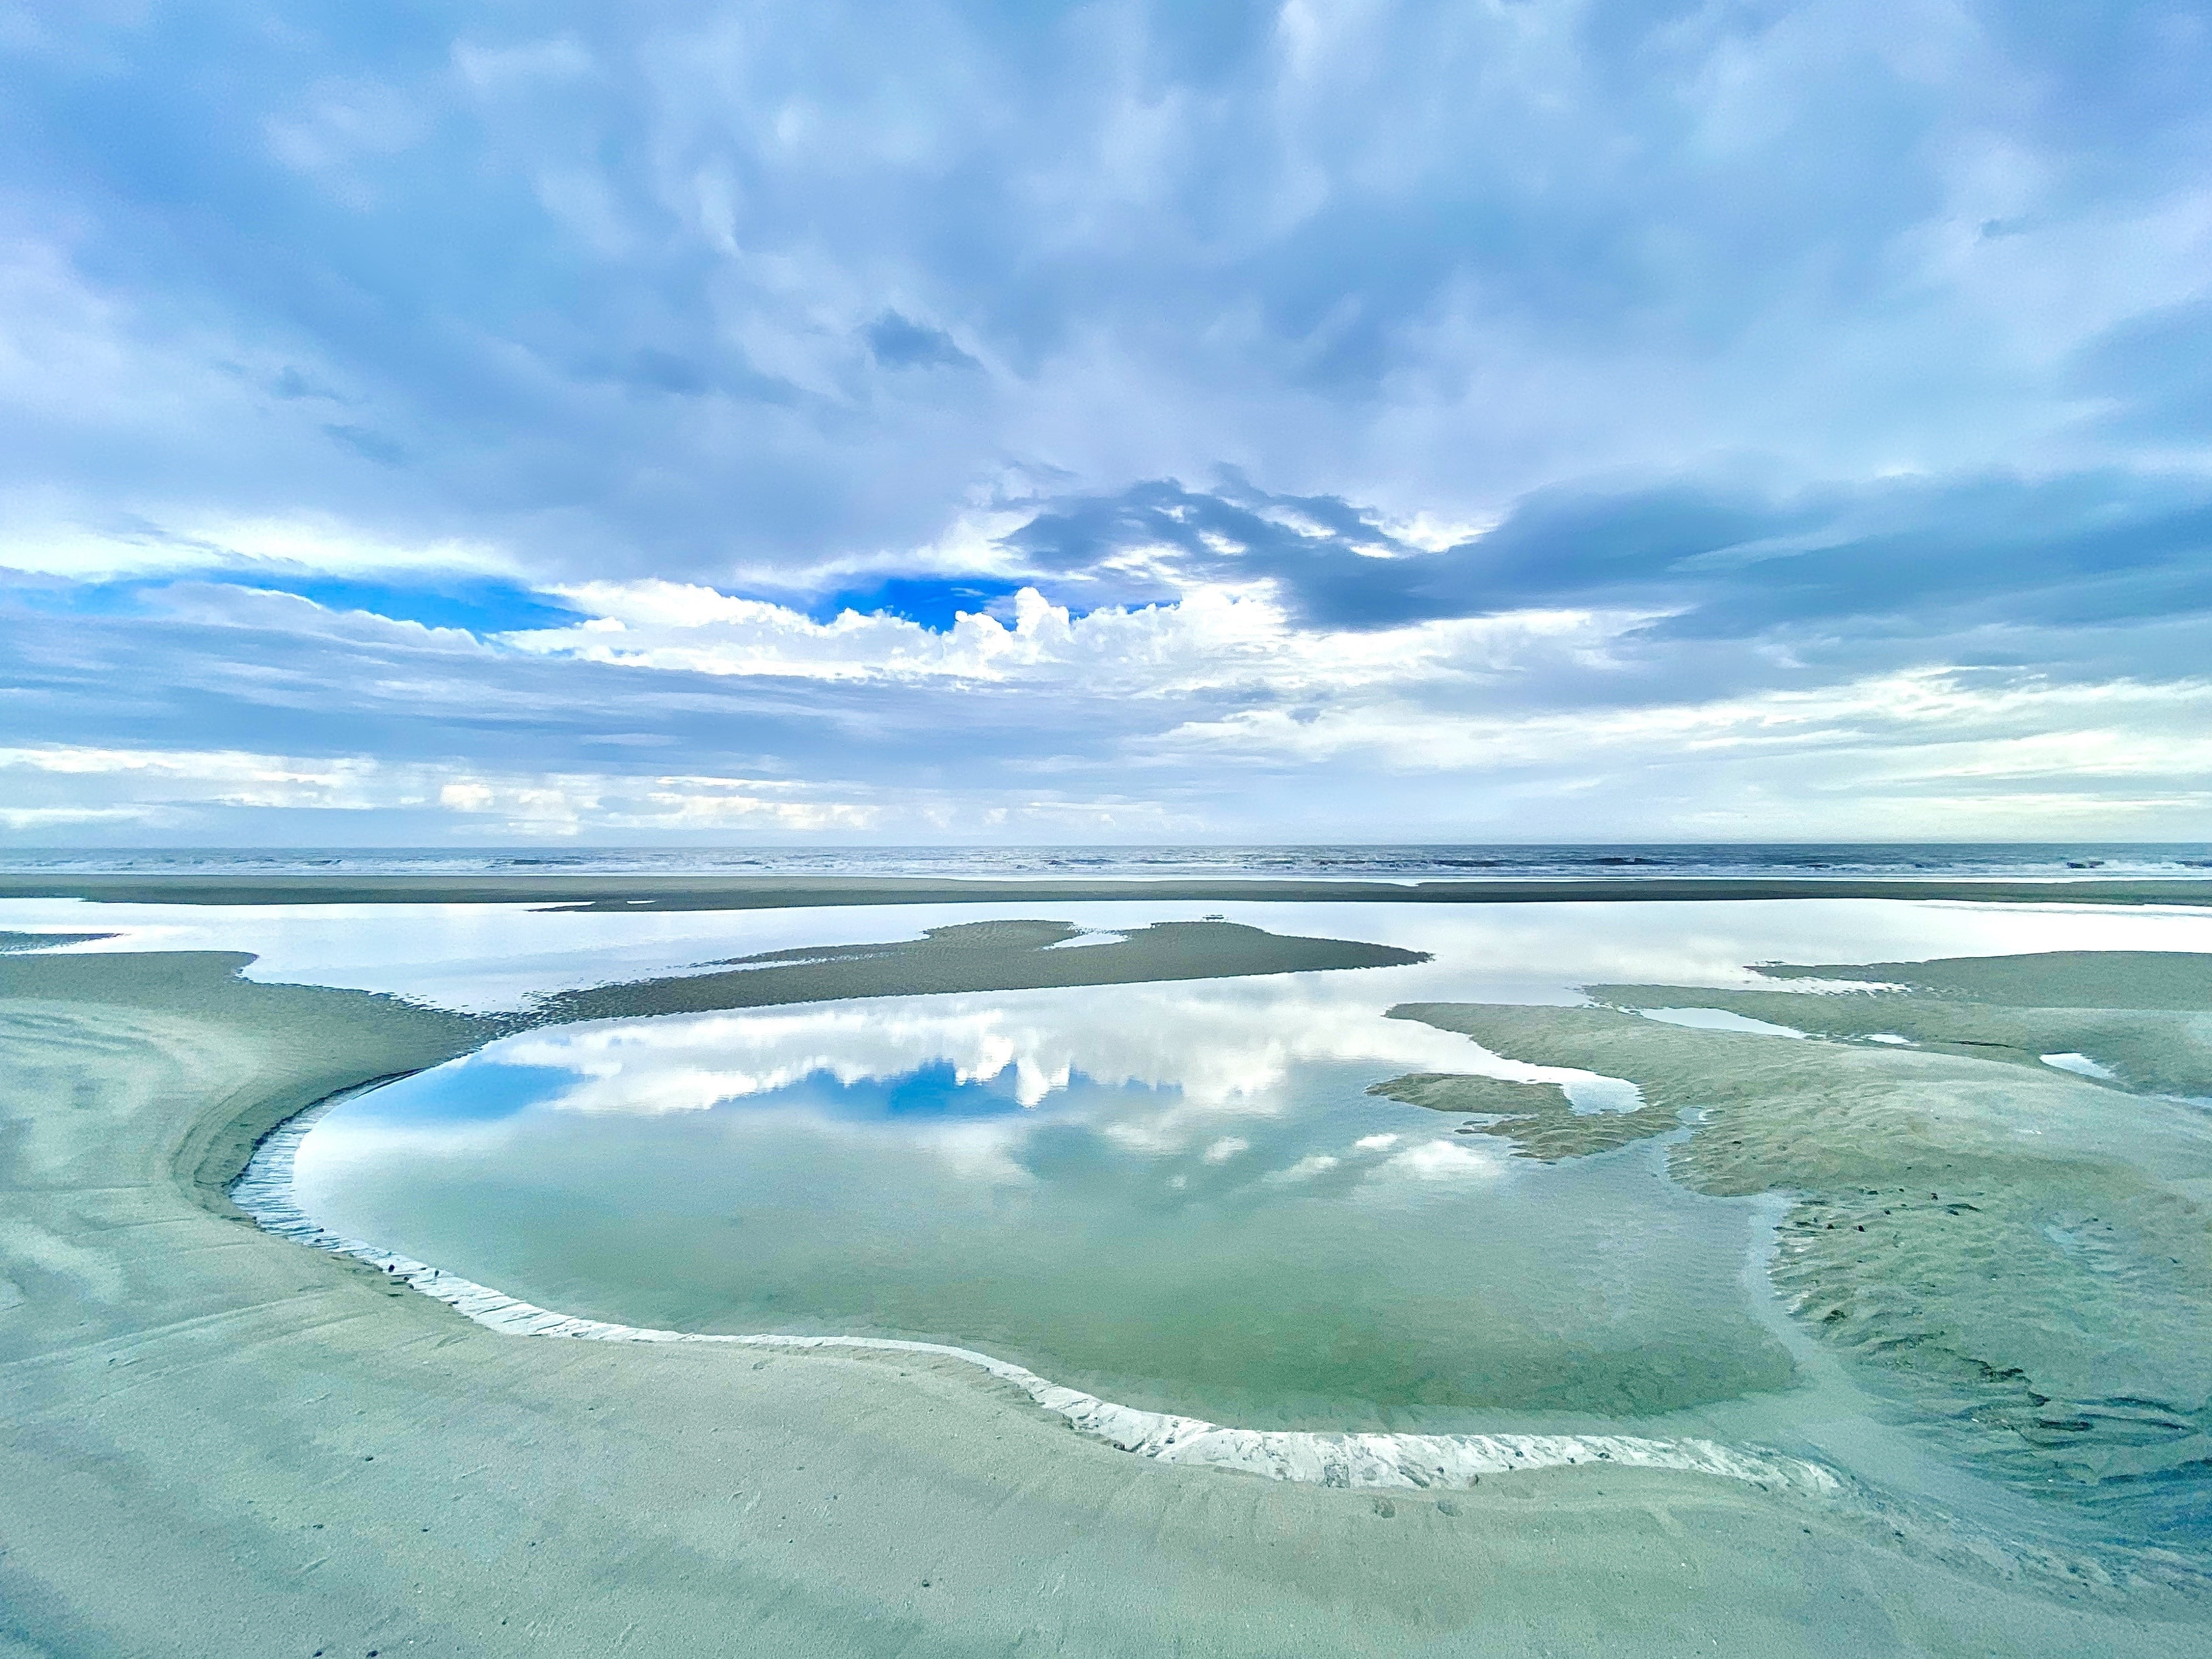 South Beach, Hilton Head Island, South Carolina, United States of America